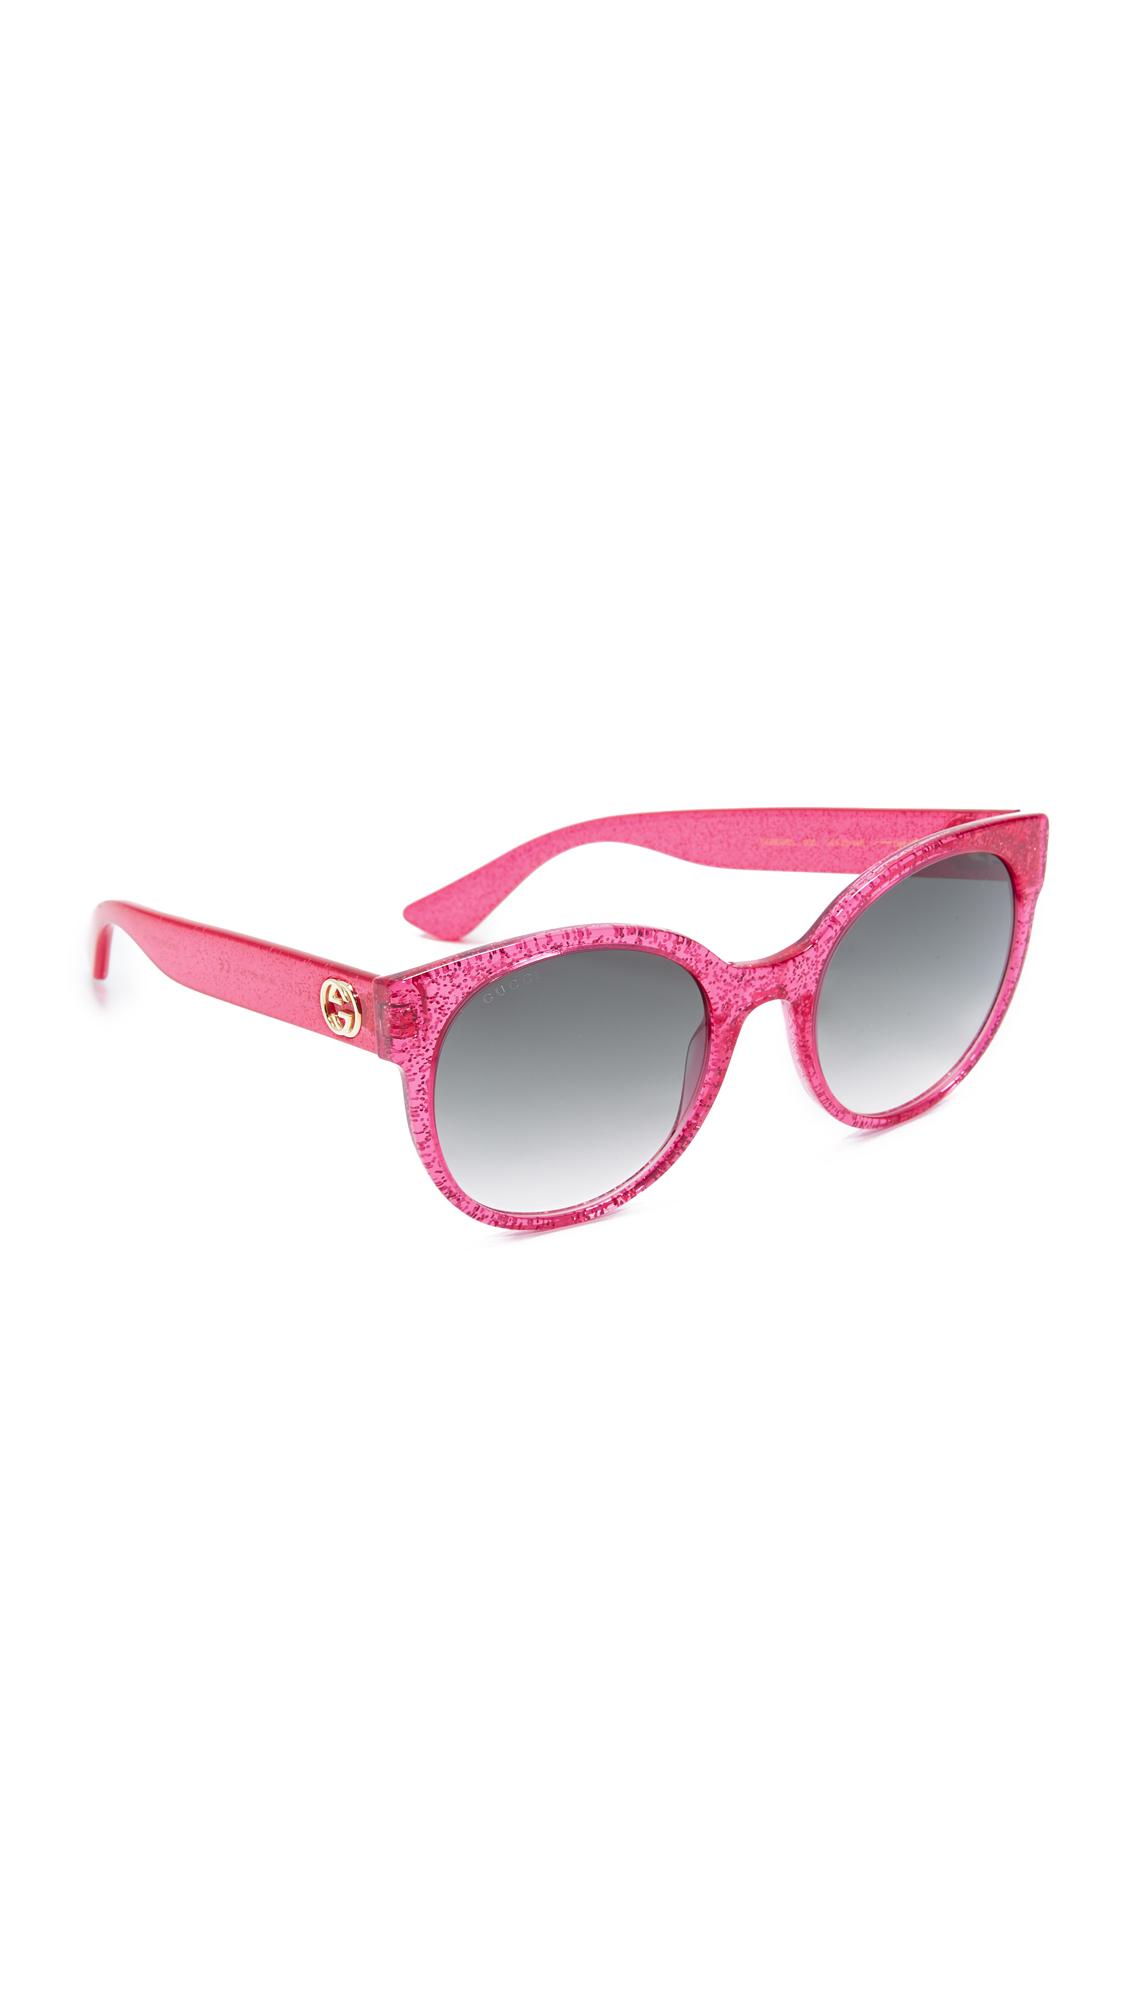 Gucci Urban Pop Round Sunglasses - Glitter Fuchsia/Green at Shopbop